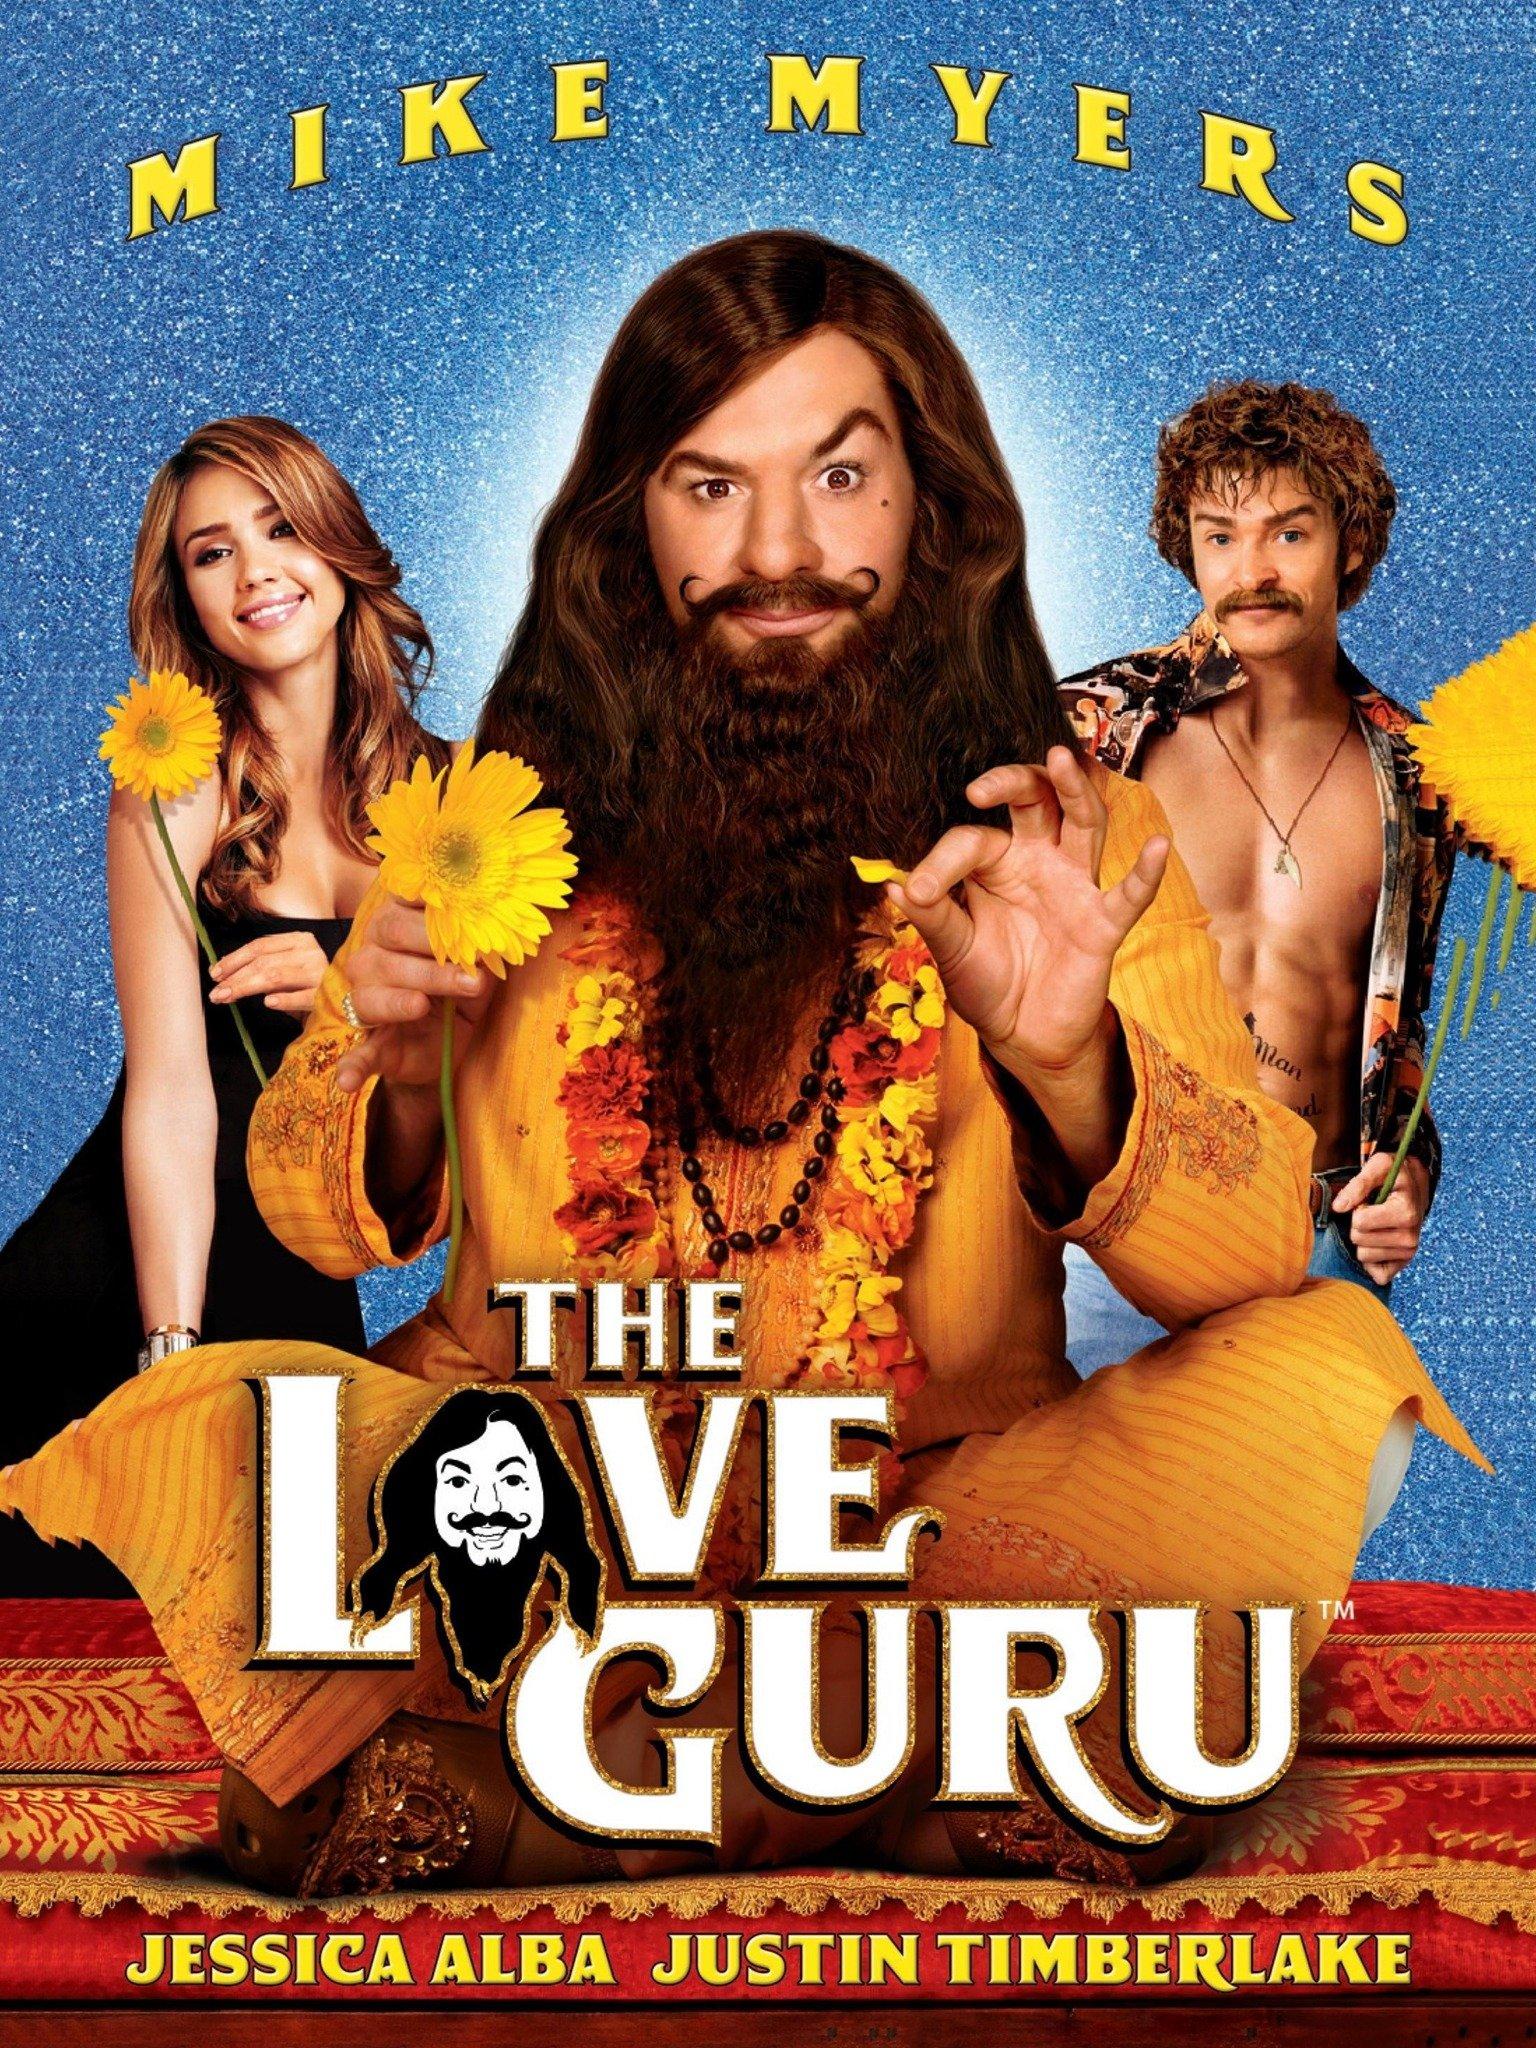 The Love Guru - Movie Reviews